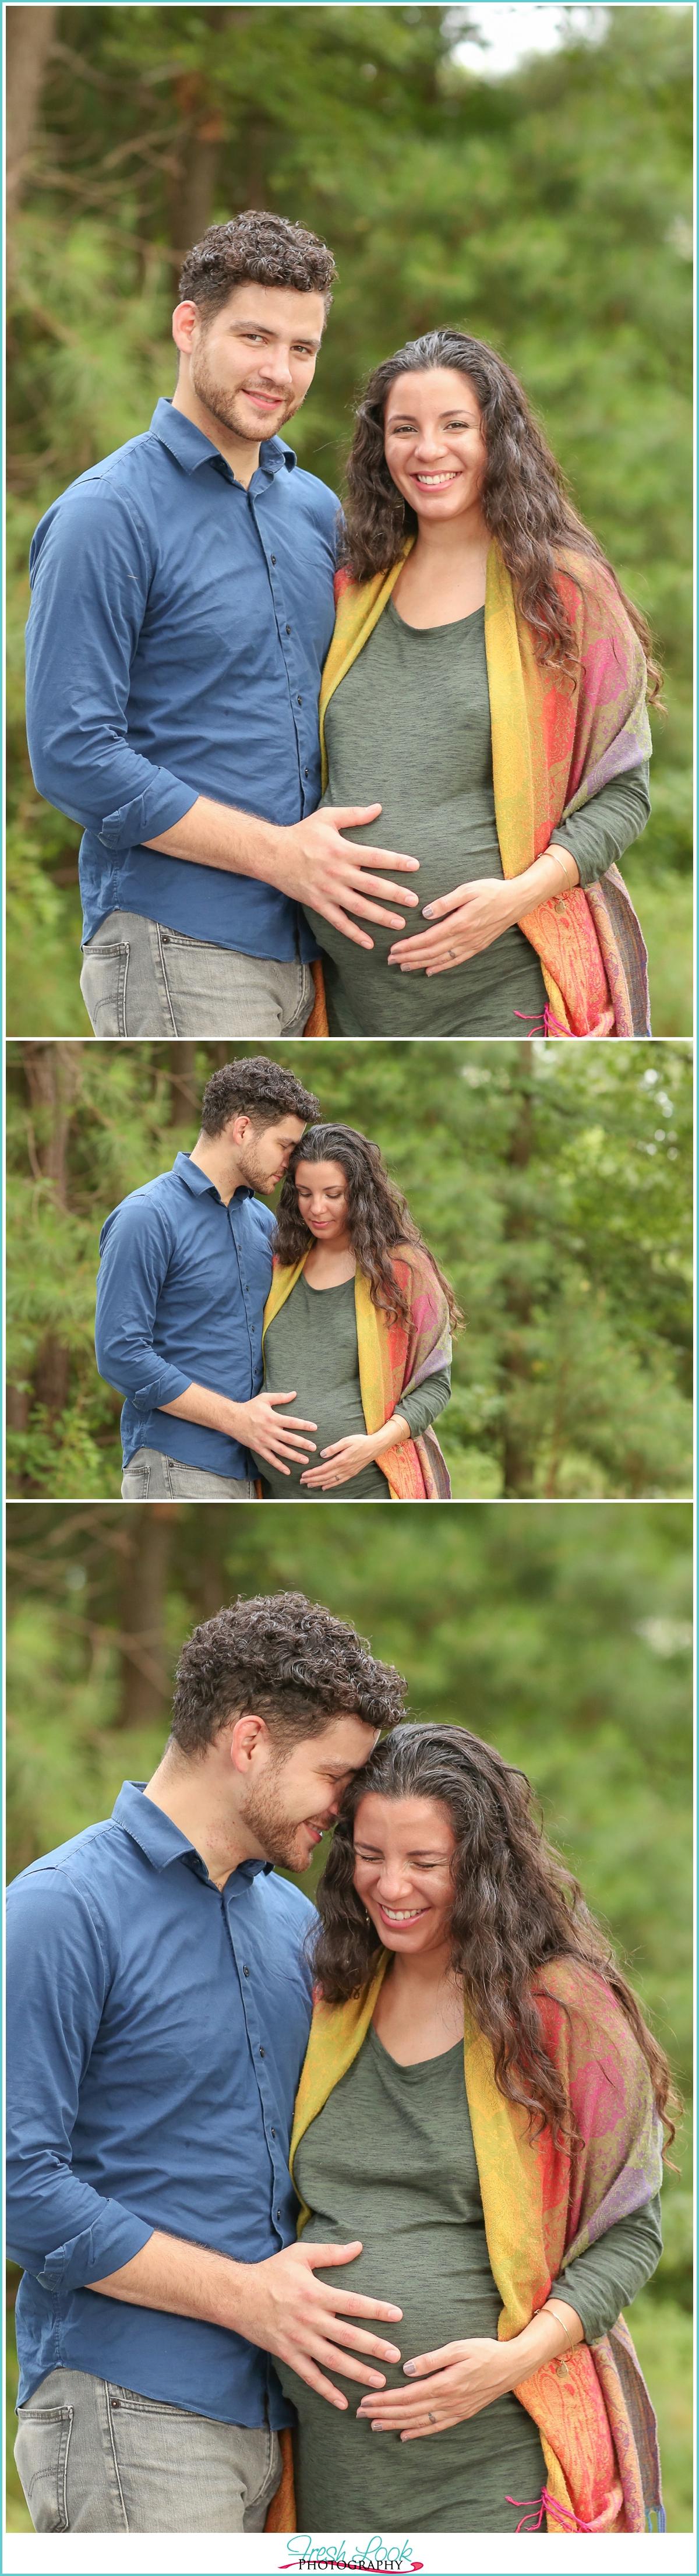 romantic maternity photo shoot